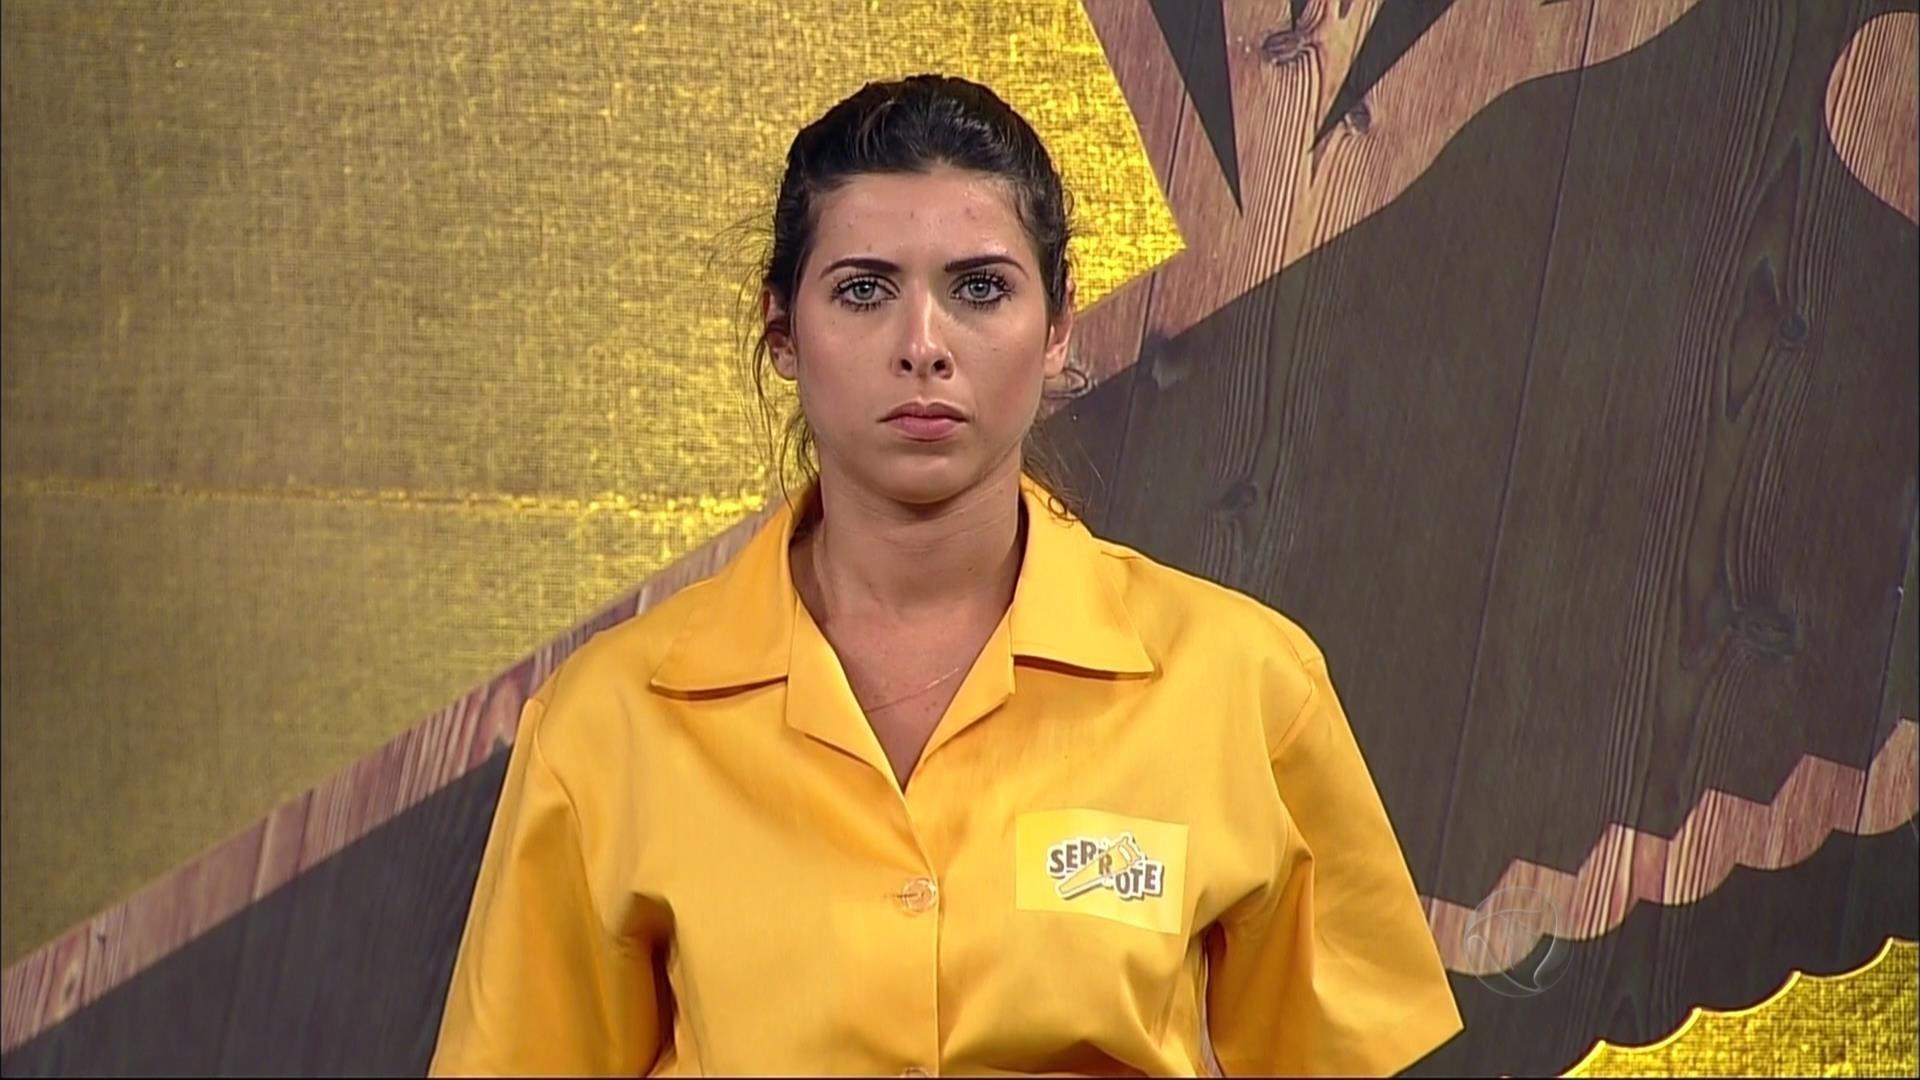 5.nov.2015 - Ana Paula Minerato participou da prova da chave em nome da equipe Serrote